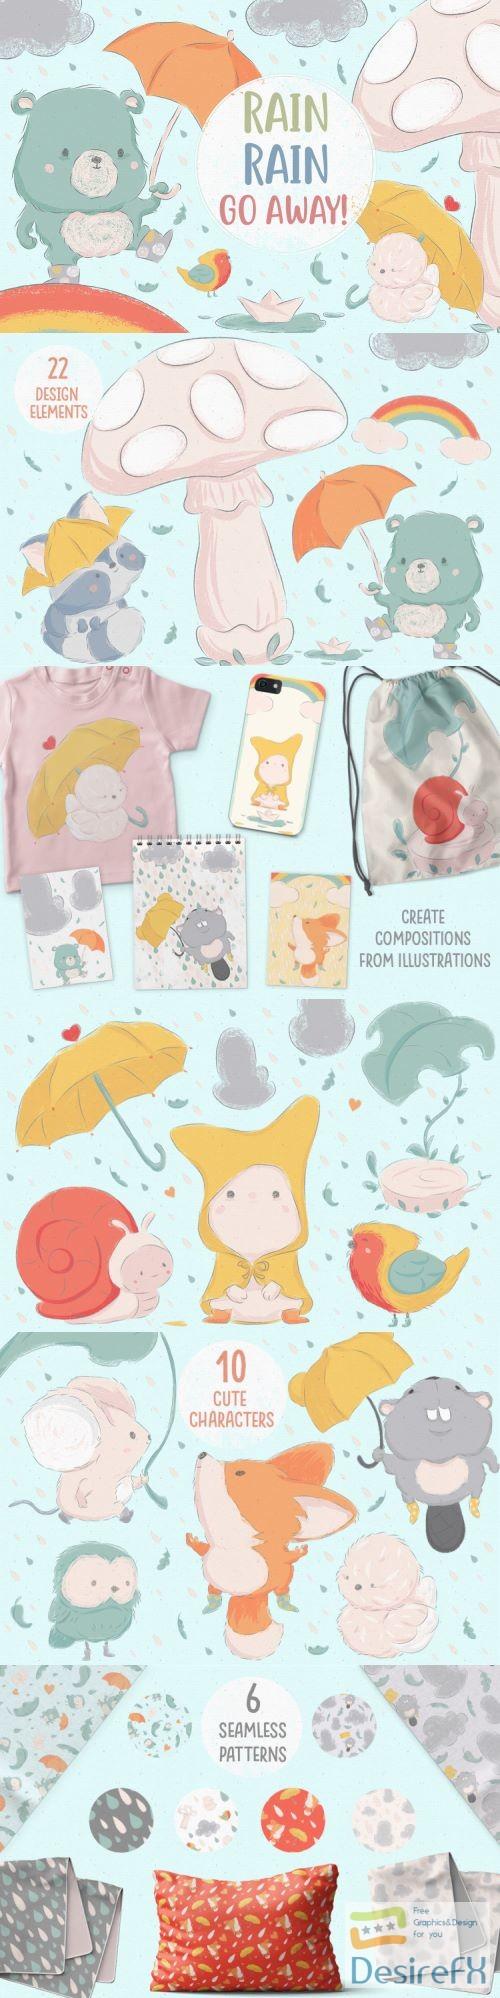 stock-vectors - Rain, Rain, Go Away! - 256256